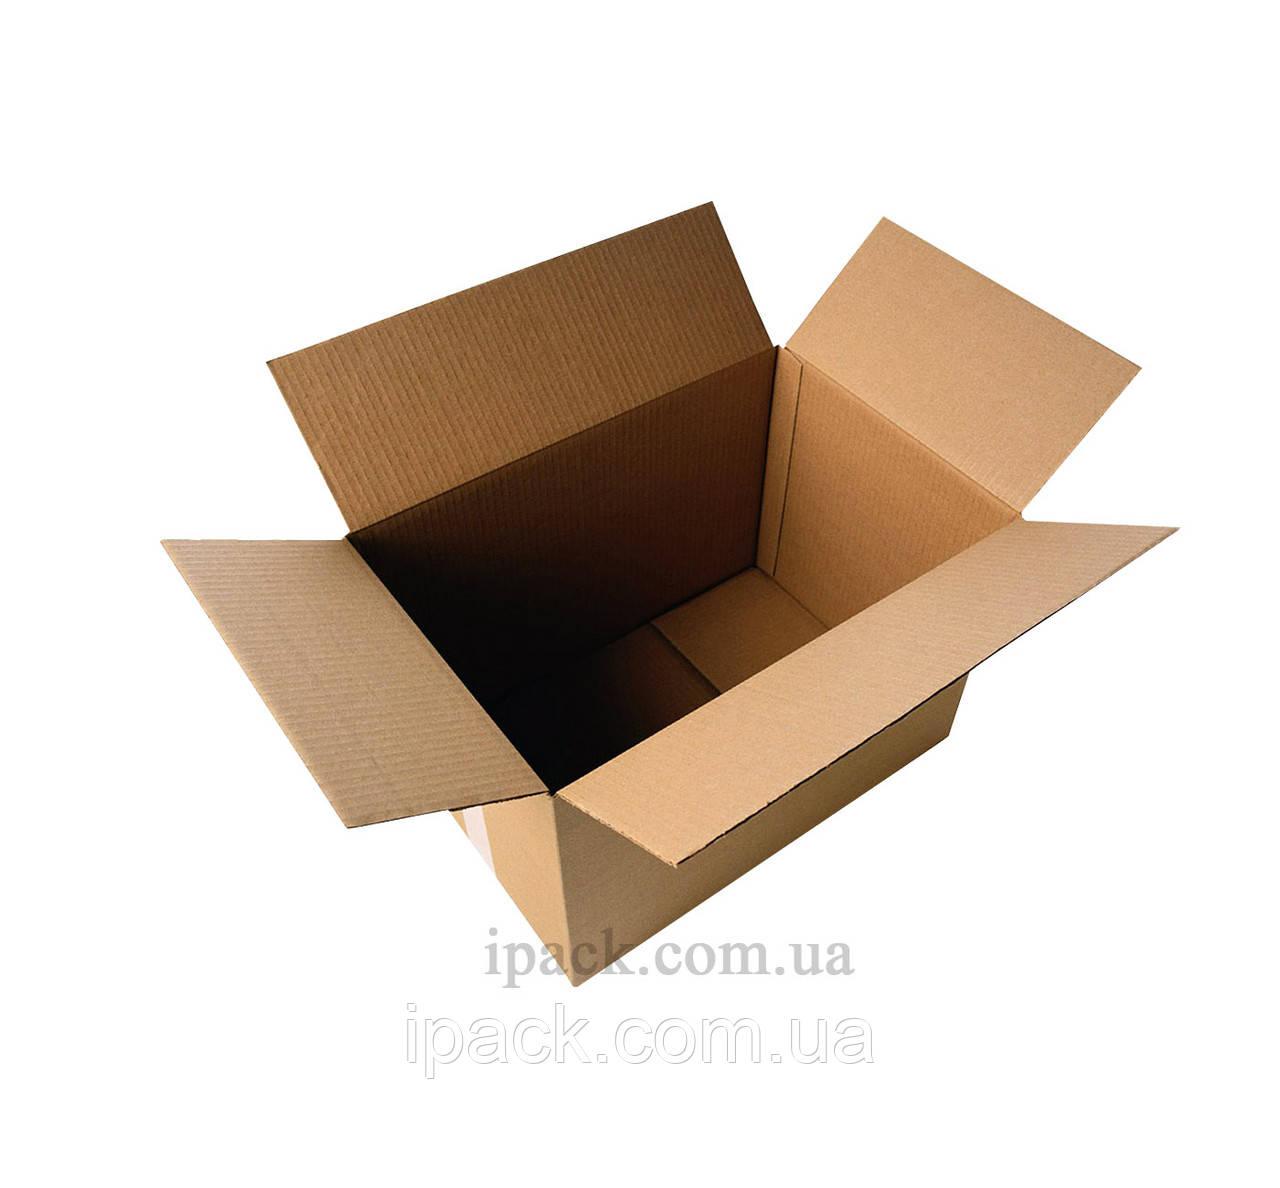 Гофроящик 730*540*470 мм, бурый, четырехклапанный картонный короб